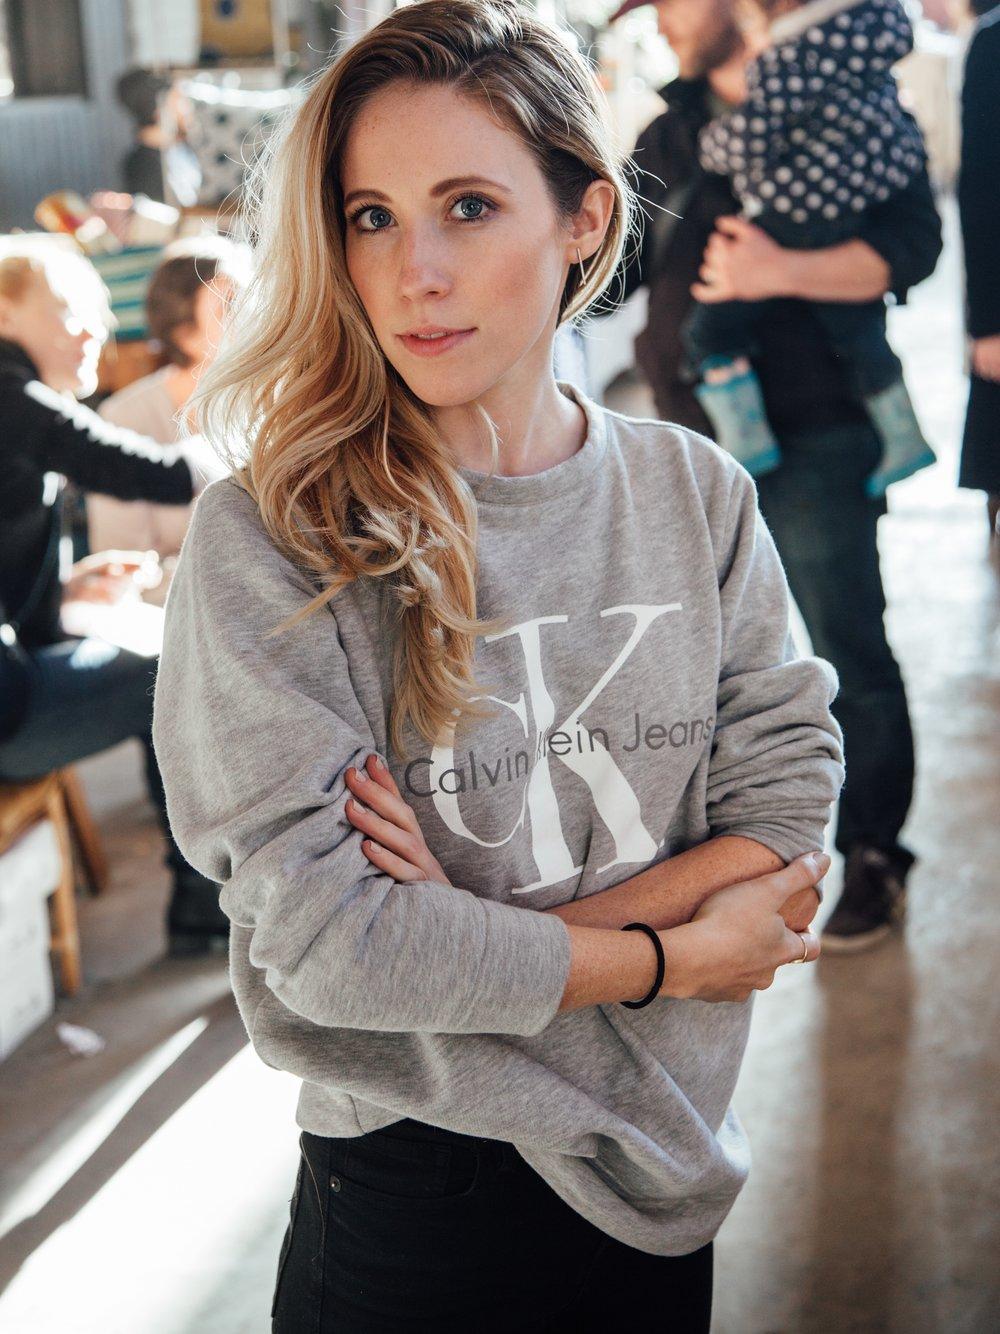 Lindsay, Collaborating Photographer